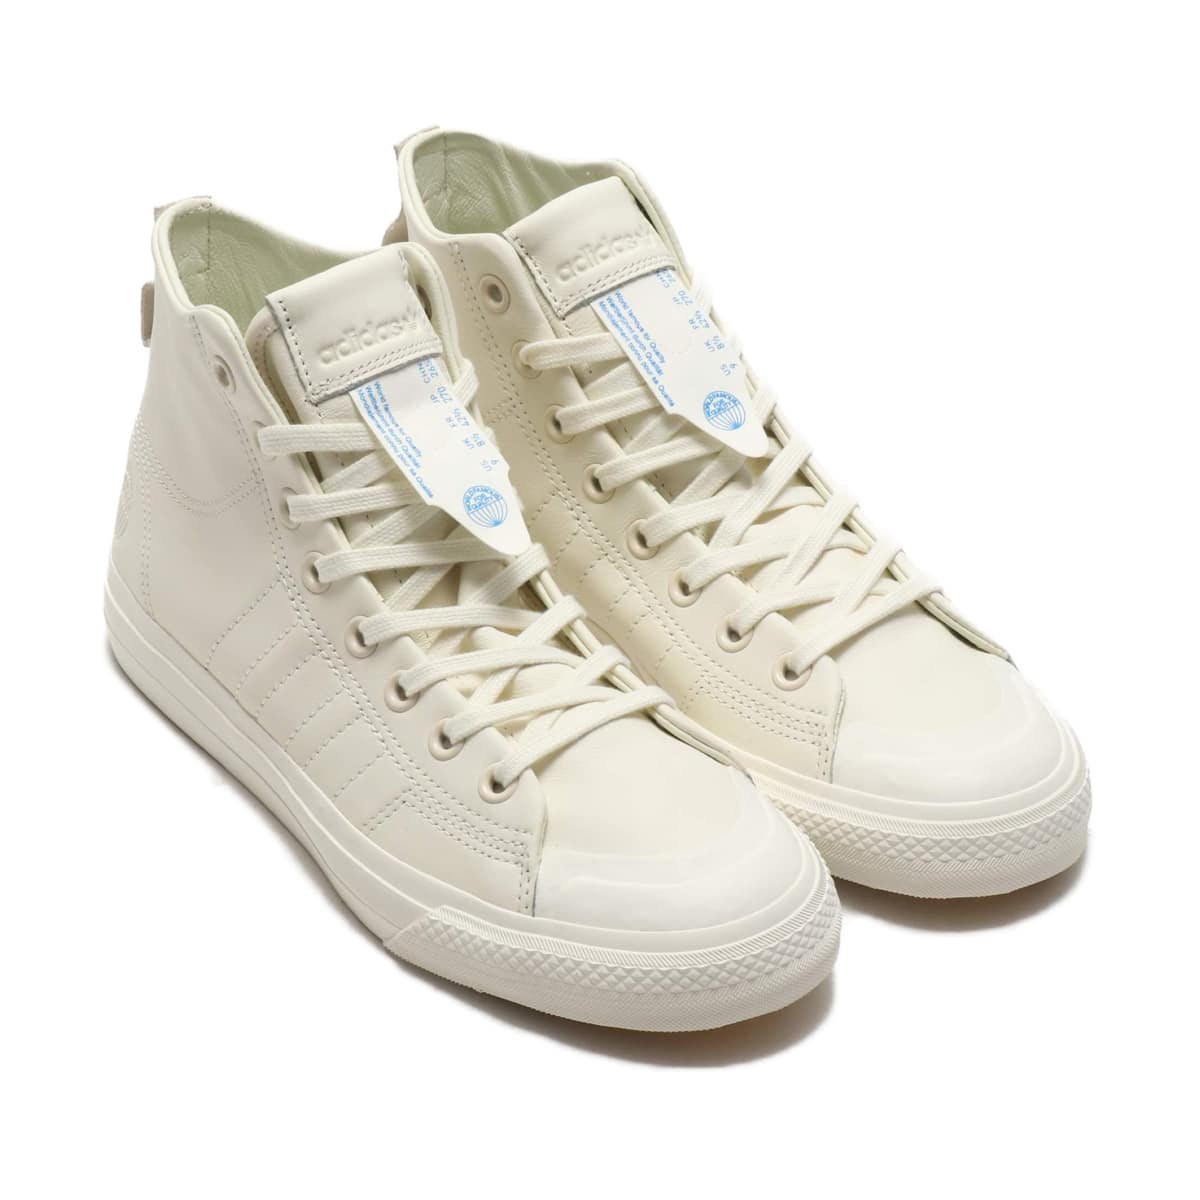 adidas NIZZA HI RF OFF WHITE/OFF WHITE/OFF WHITE 20SS-S_photo_large